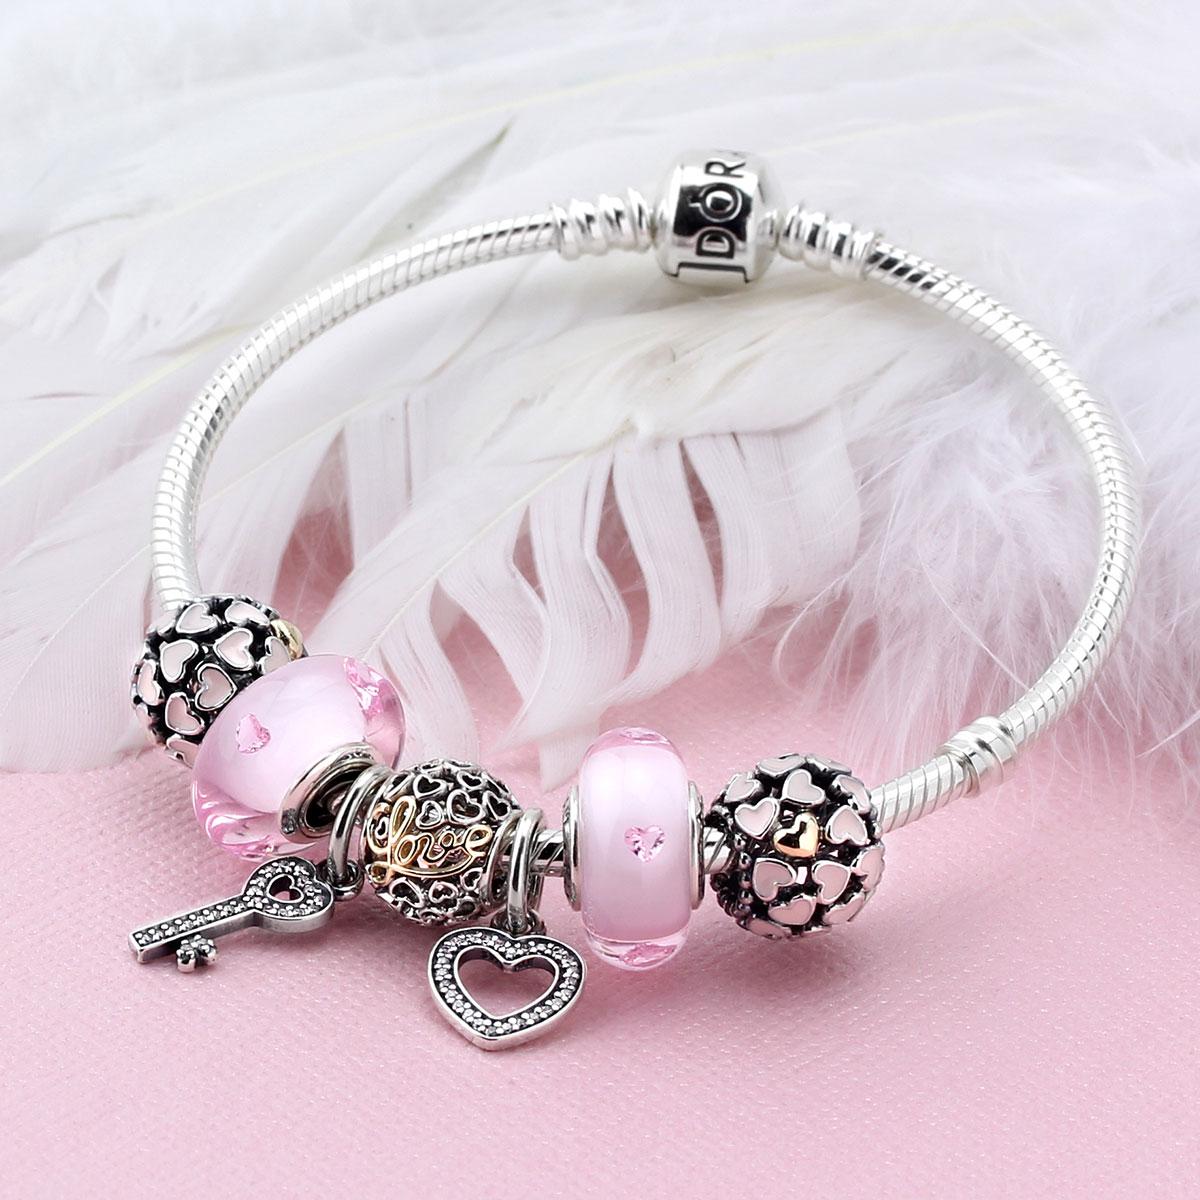 Pandora Bracelet Design Ideas pandora leathercolosseum Pandora Designer Bracelets